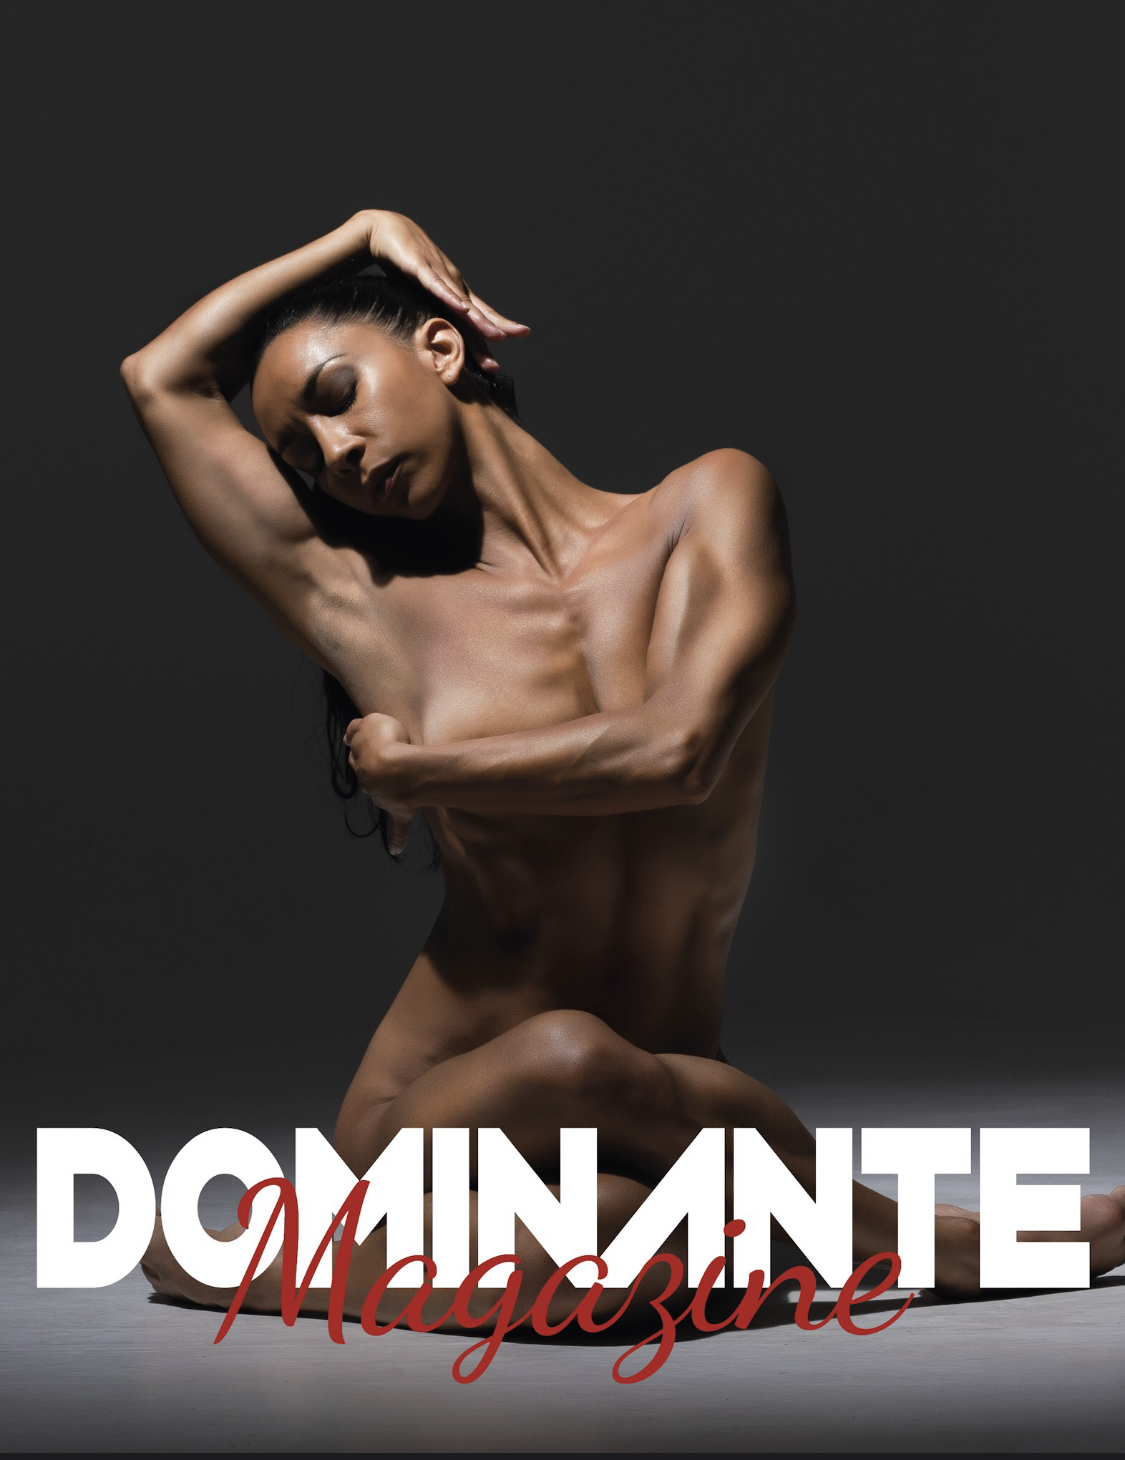 Dominante Magazine May 2021 - Photo by @enriquesantamariacortes